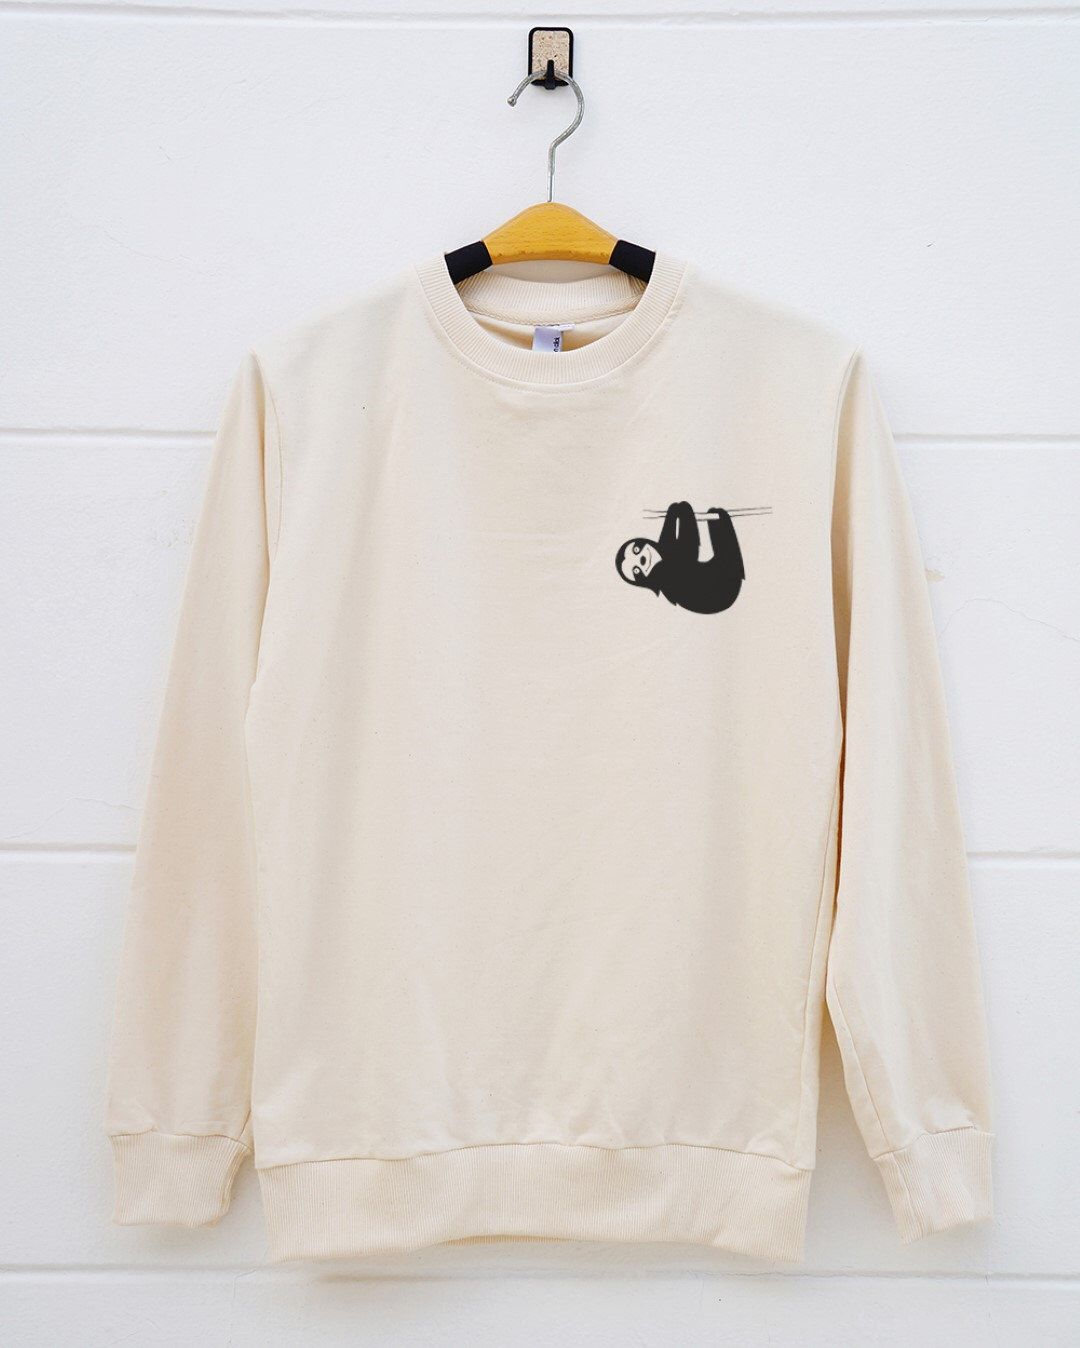 Pocket shirts sloth shirts . animal funny sloth tee shirts tumblr shirts  pullover sweatshirt sweater women ebf53cb3b